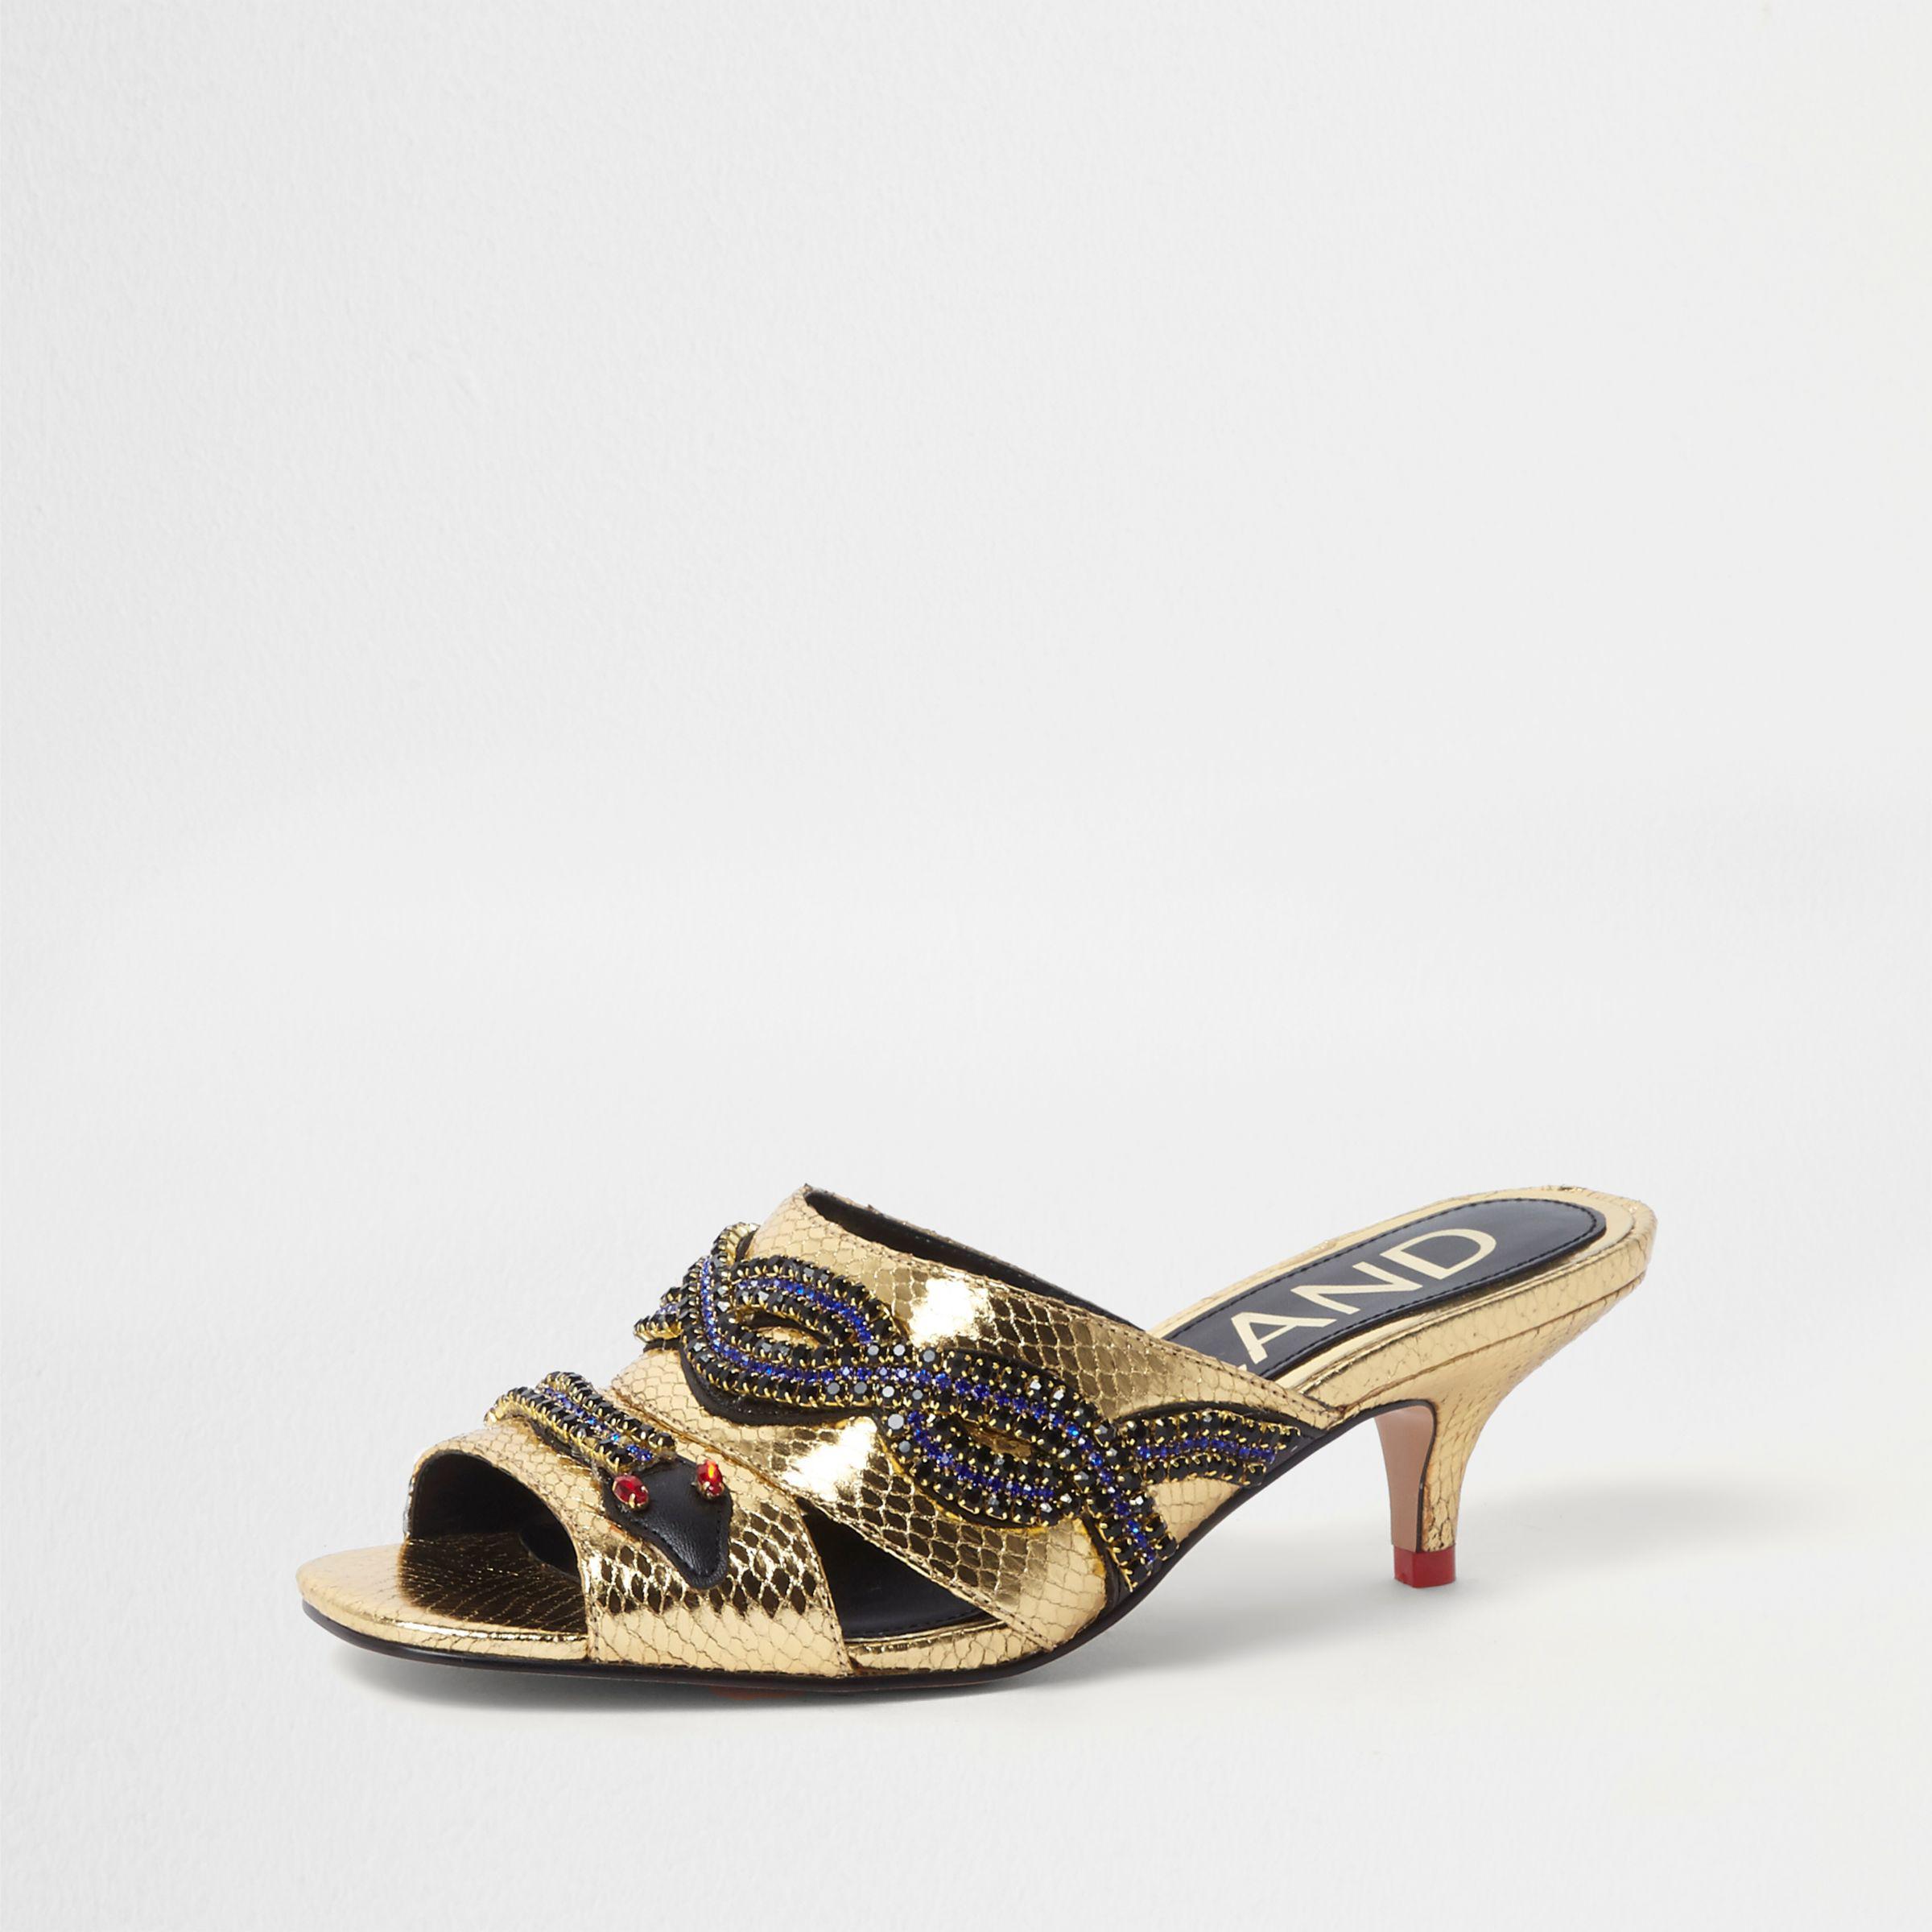 1bbf260ebbd Lyst - River Island Gold Snake Embellished Kitten Heel Mules in Metallic